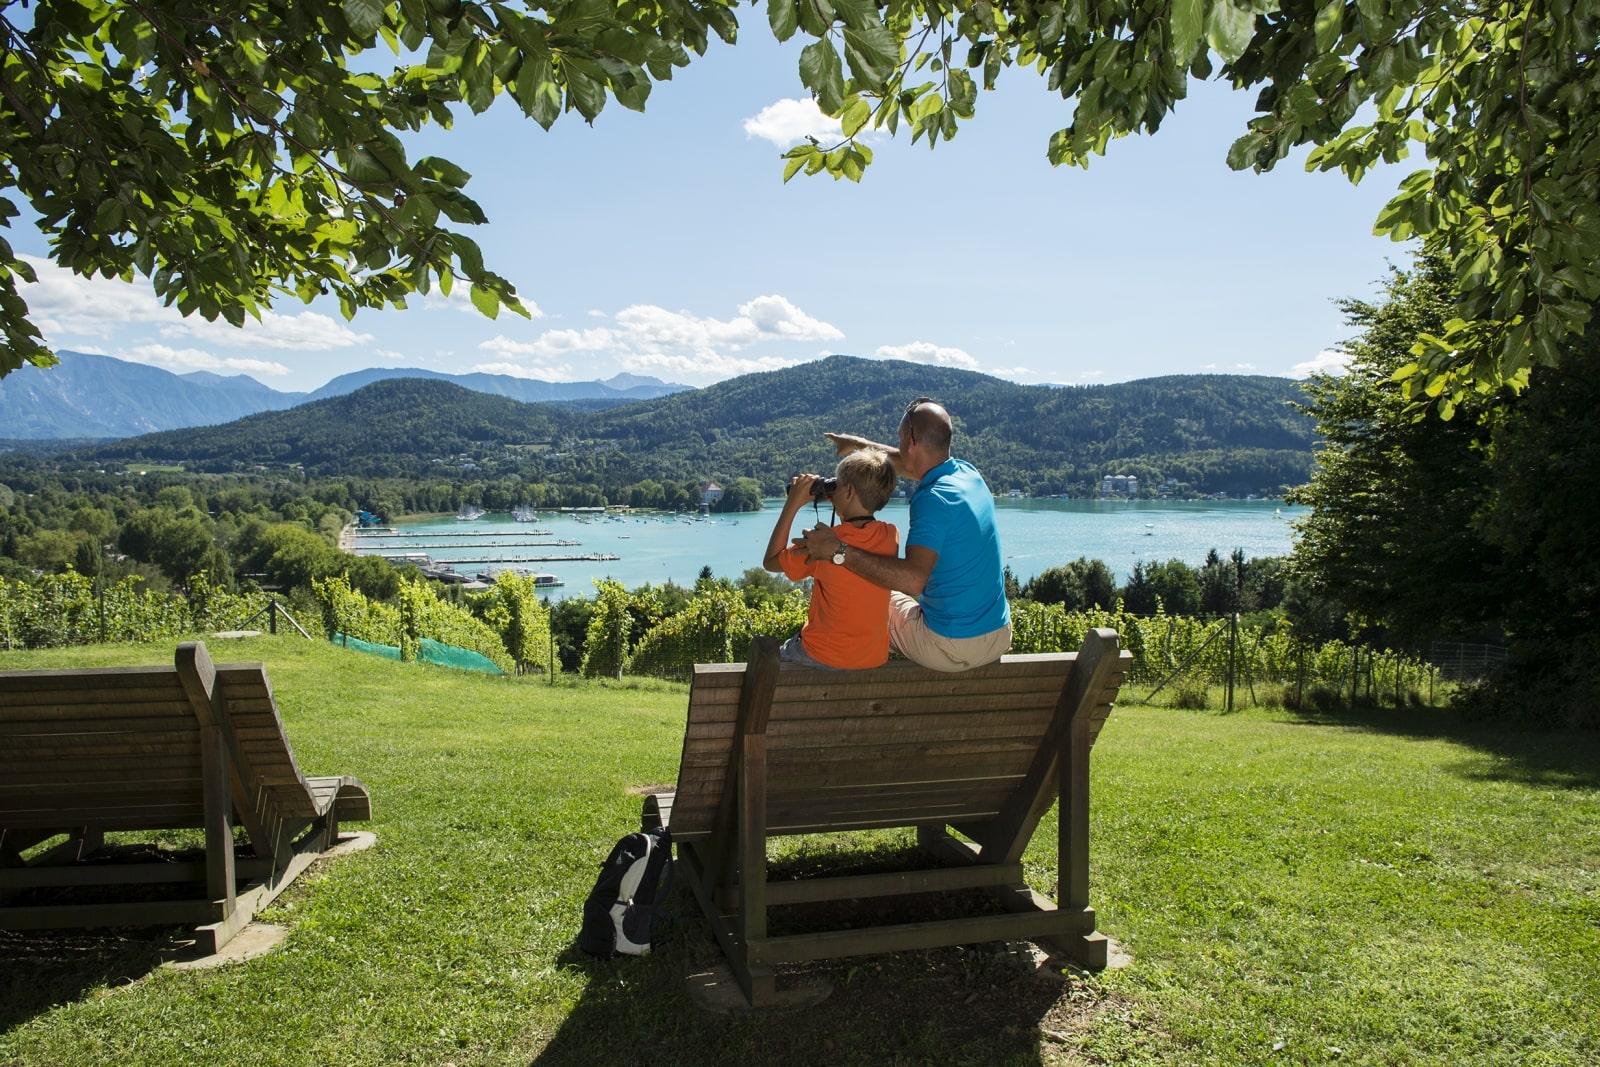 Heidi-Chalet-Falkert-Heidialm-Natur-See-Baden-Picknick-Liege